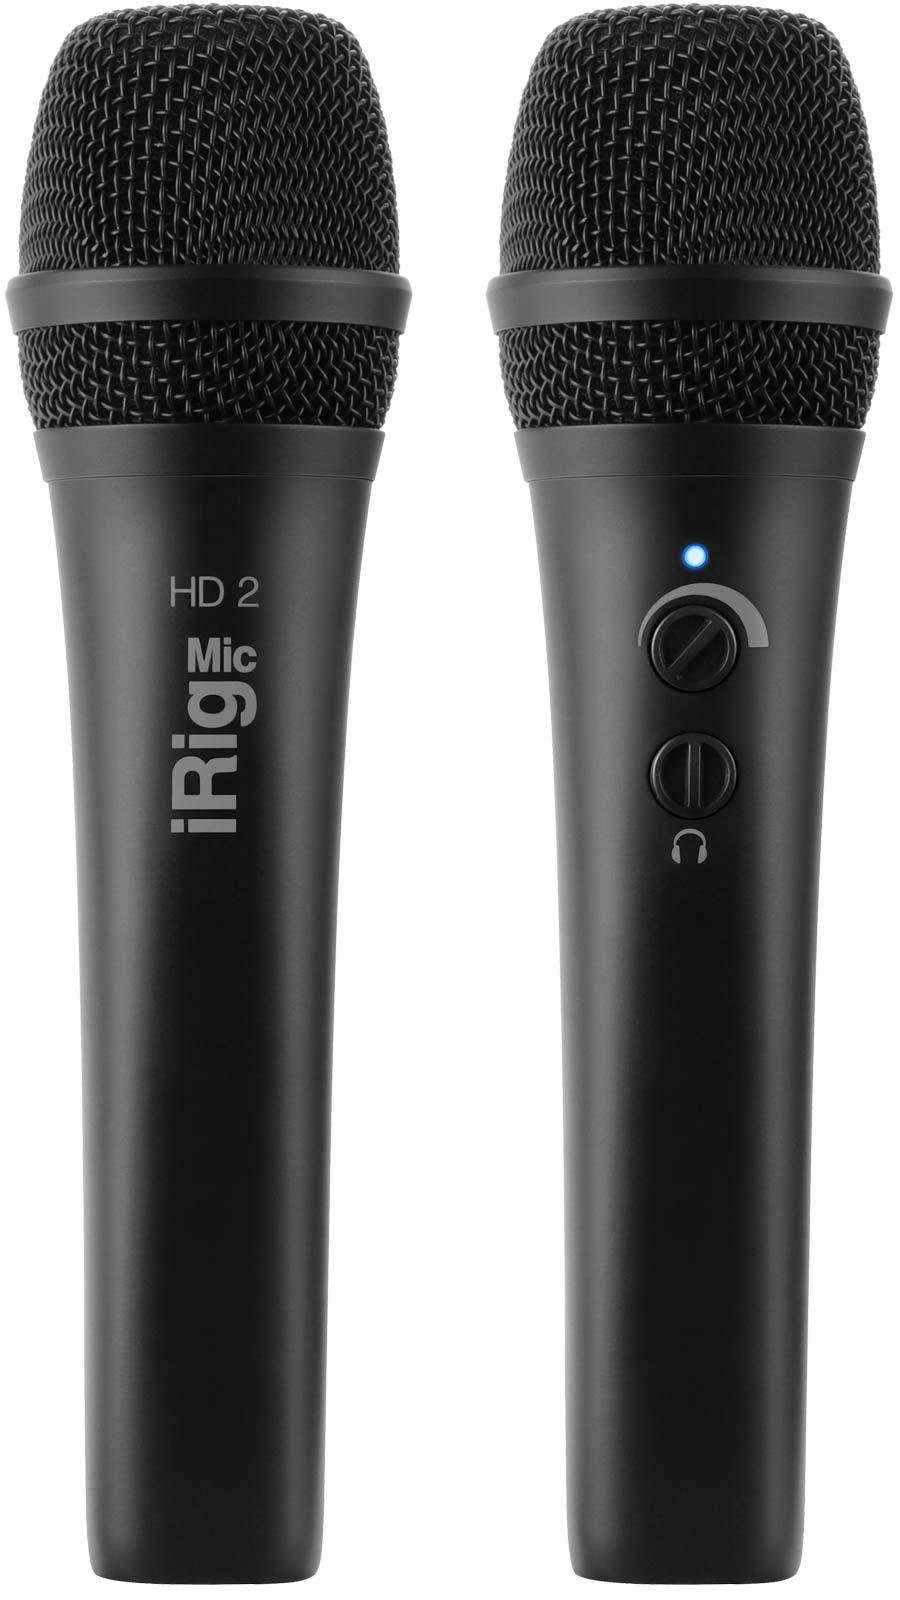 iRig Mic HD 2